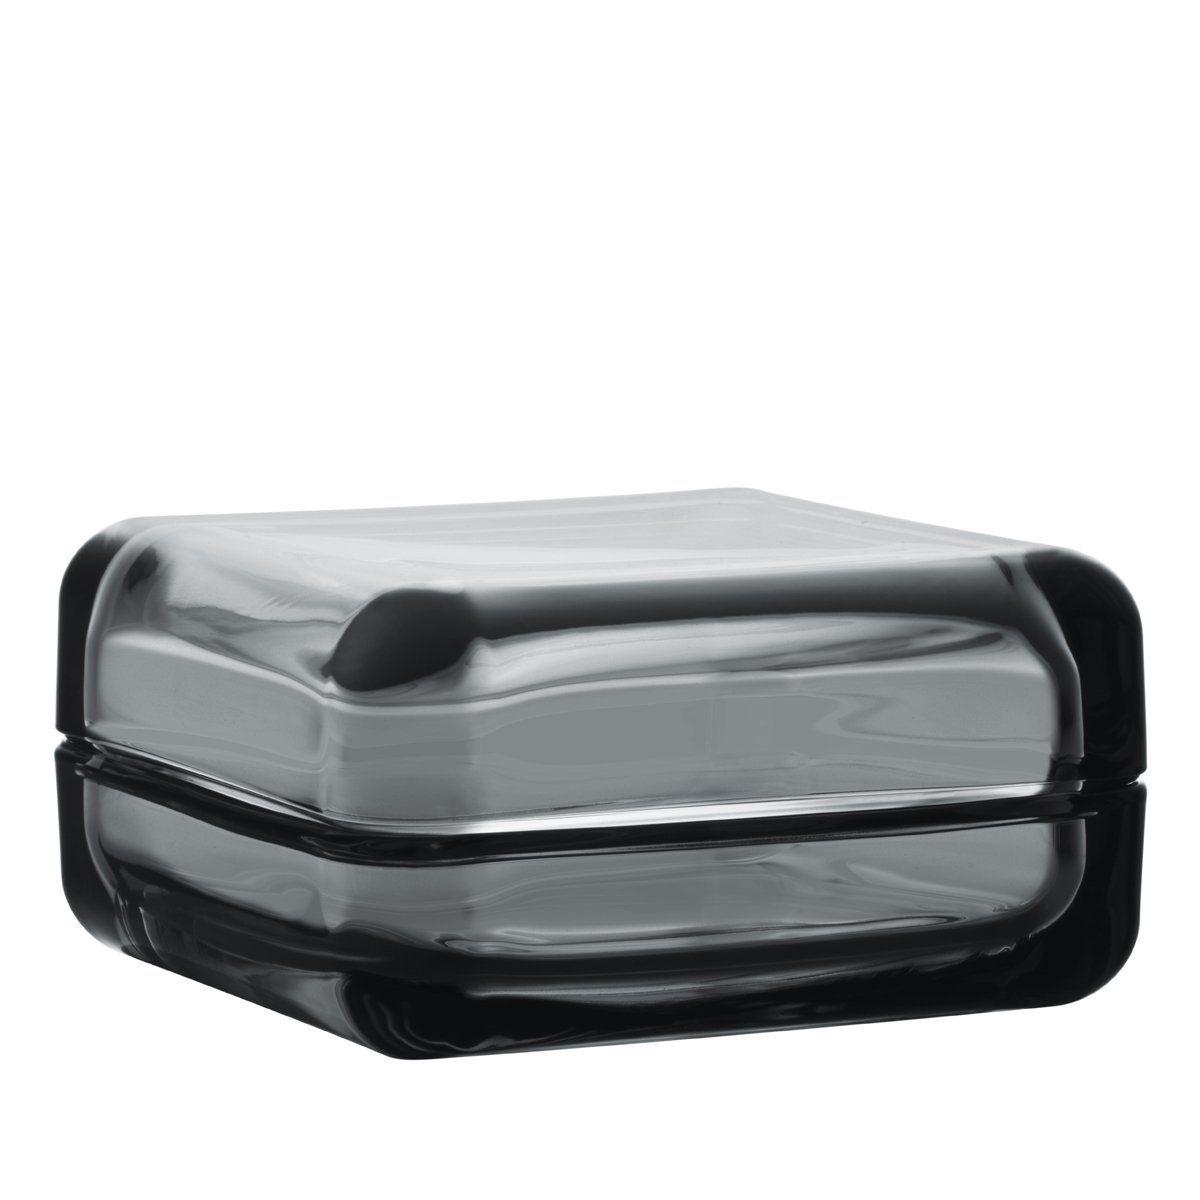 IITTALA Iittala VITRIINI Glasbox 10.8 cm grau